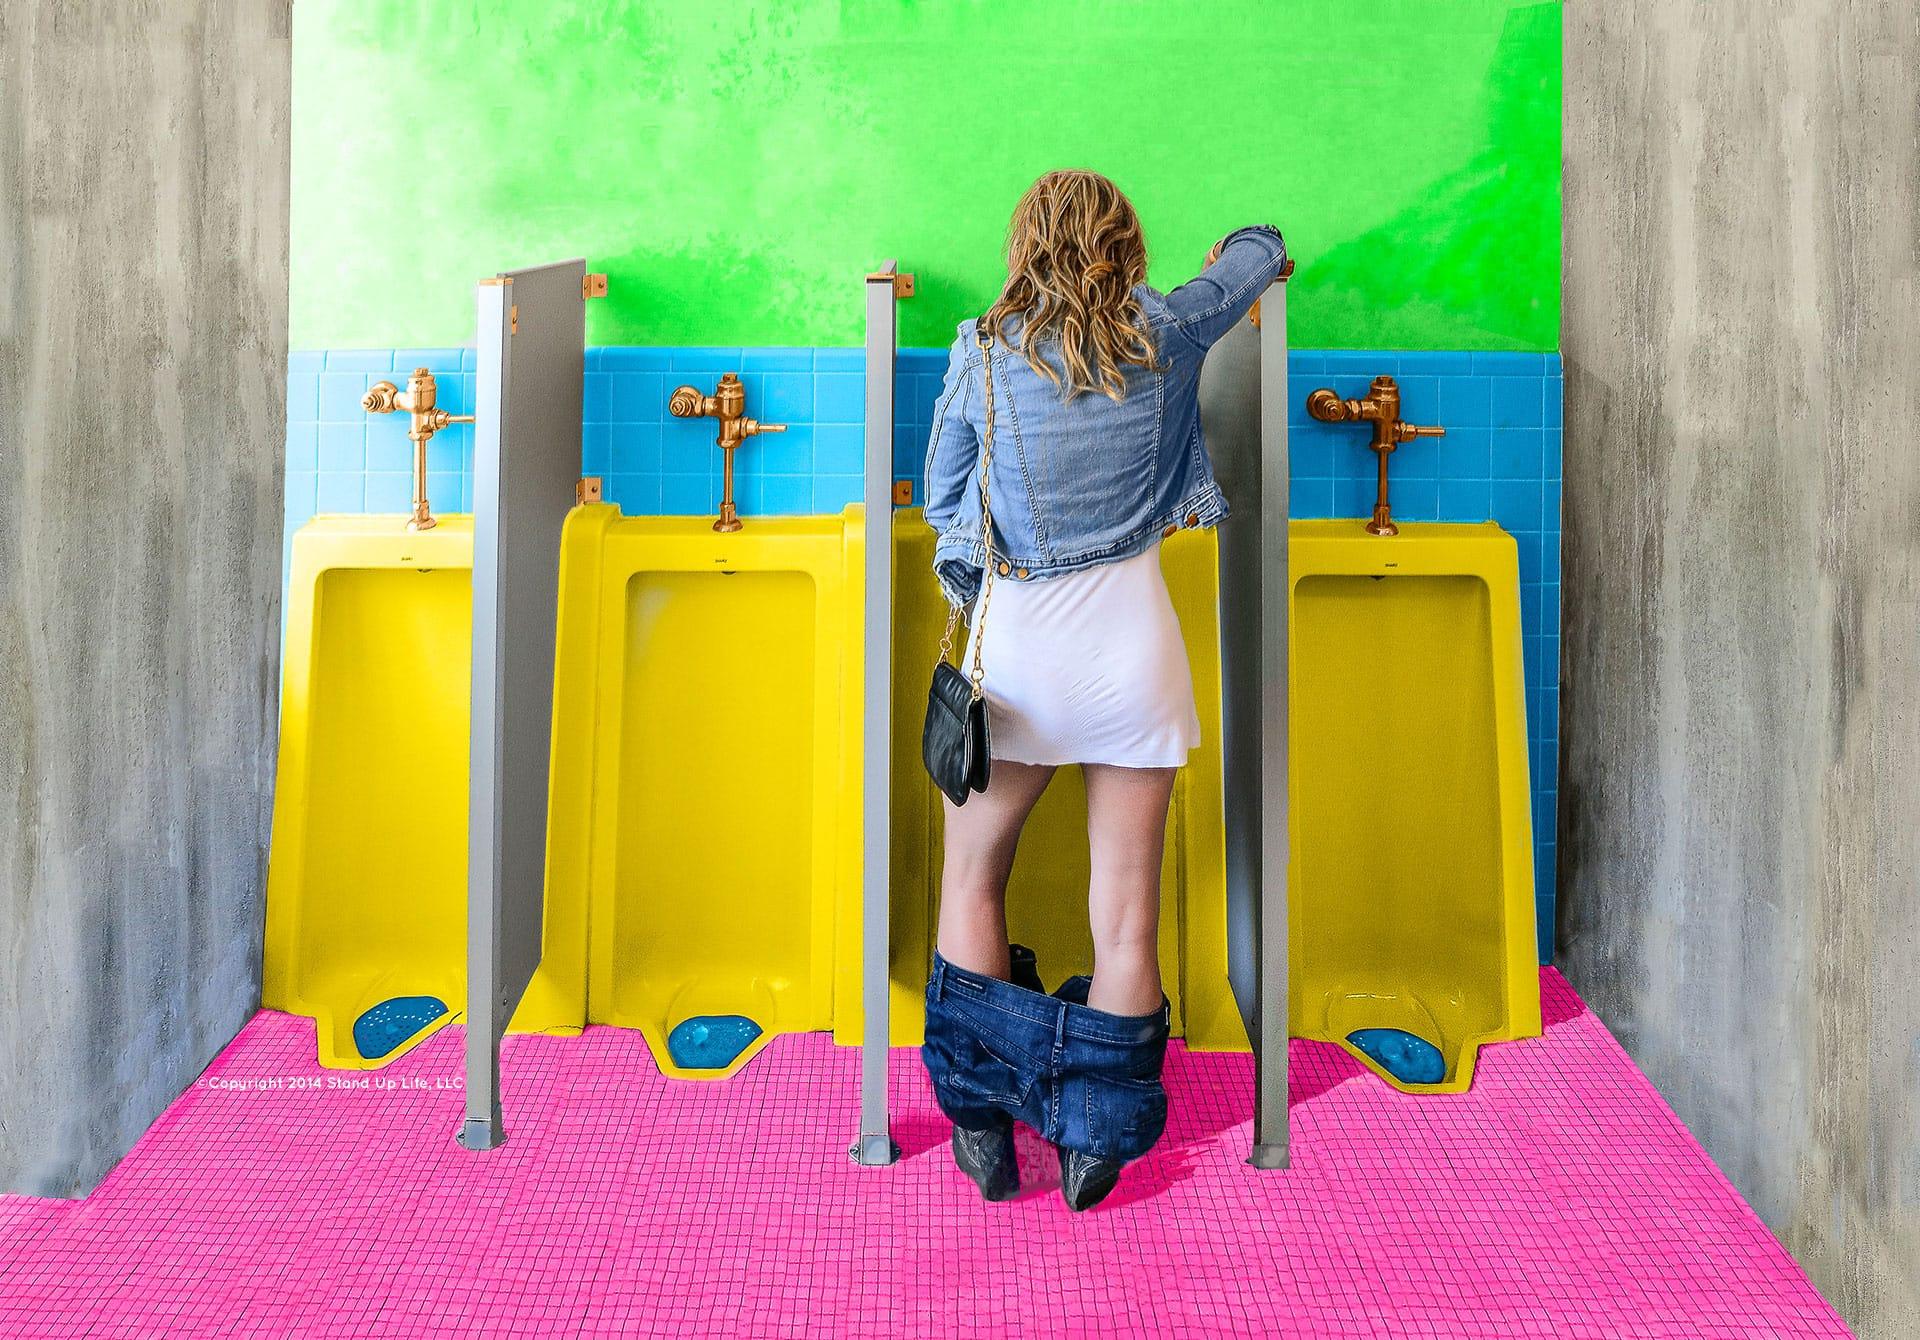 Women going to the bathroom standing up - Women Going To The Bathroom Standing Up 2